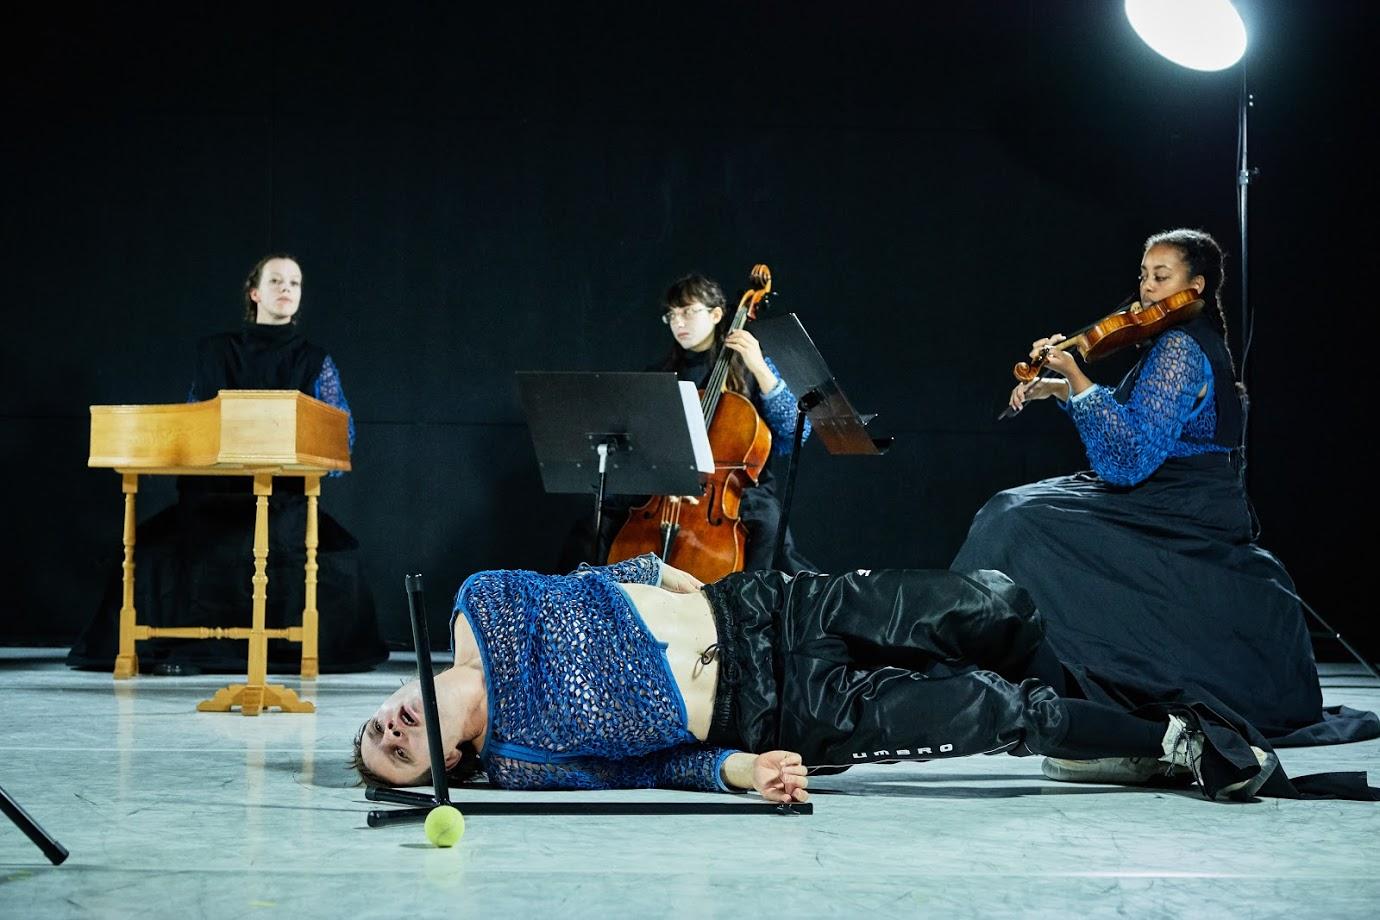 Teaterblik: Mathias Monrad Møller: The Combat